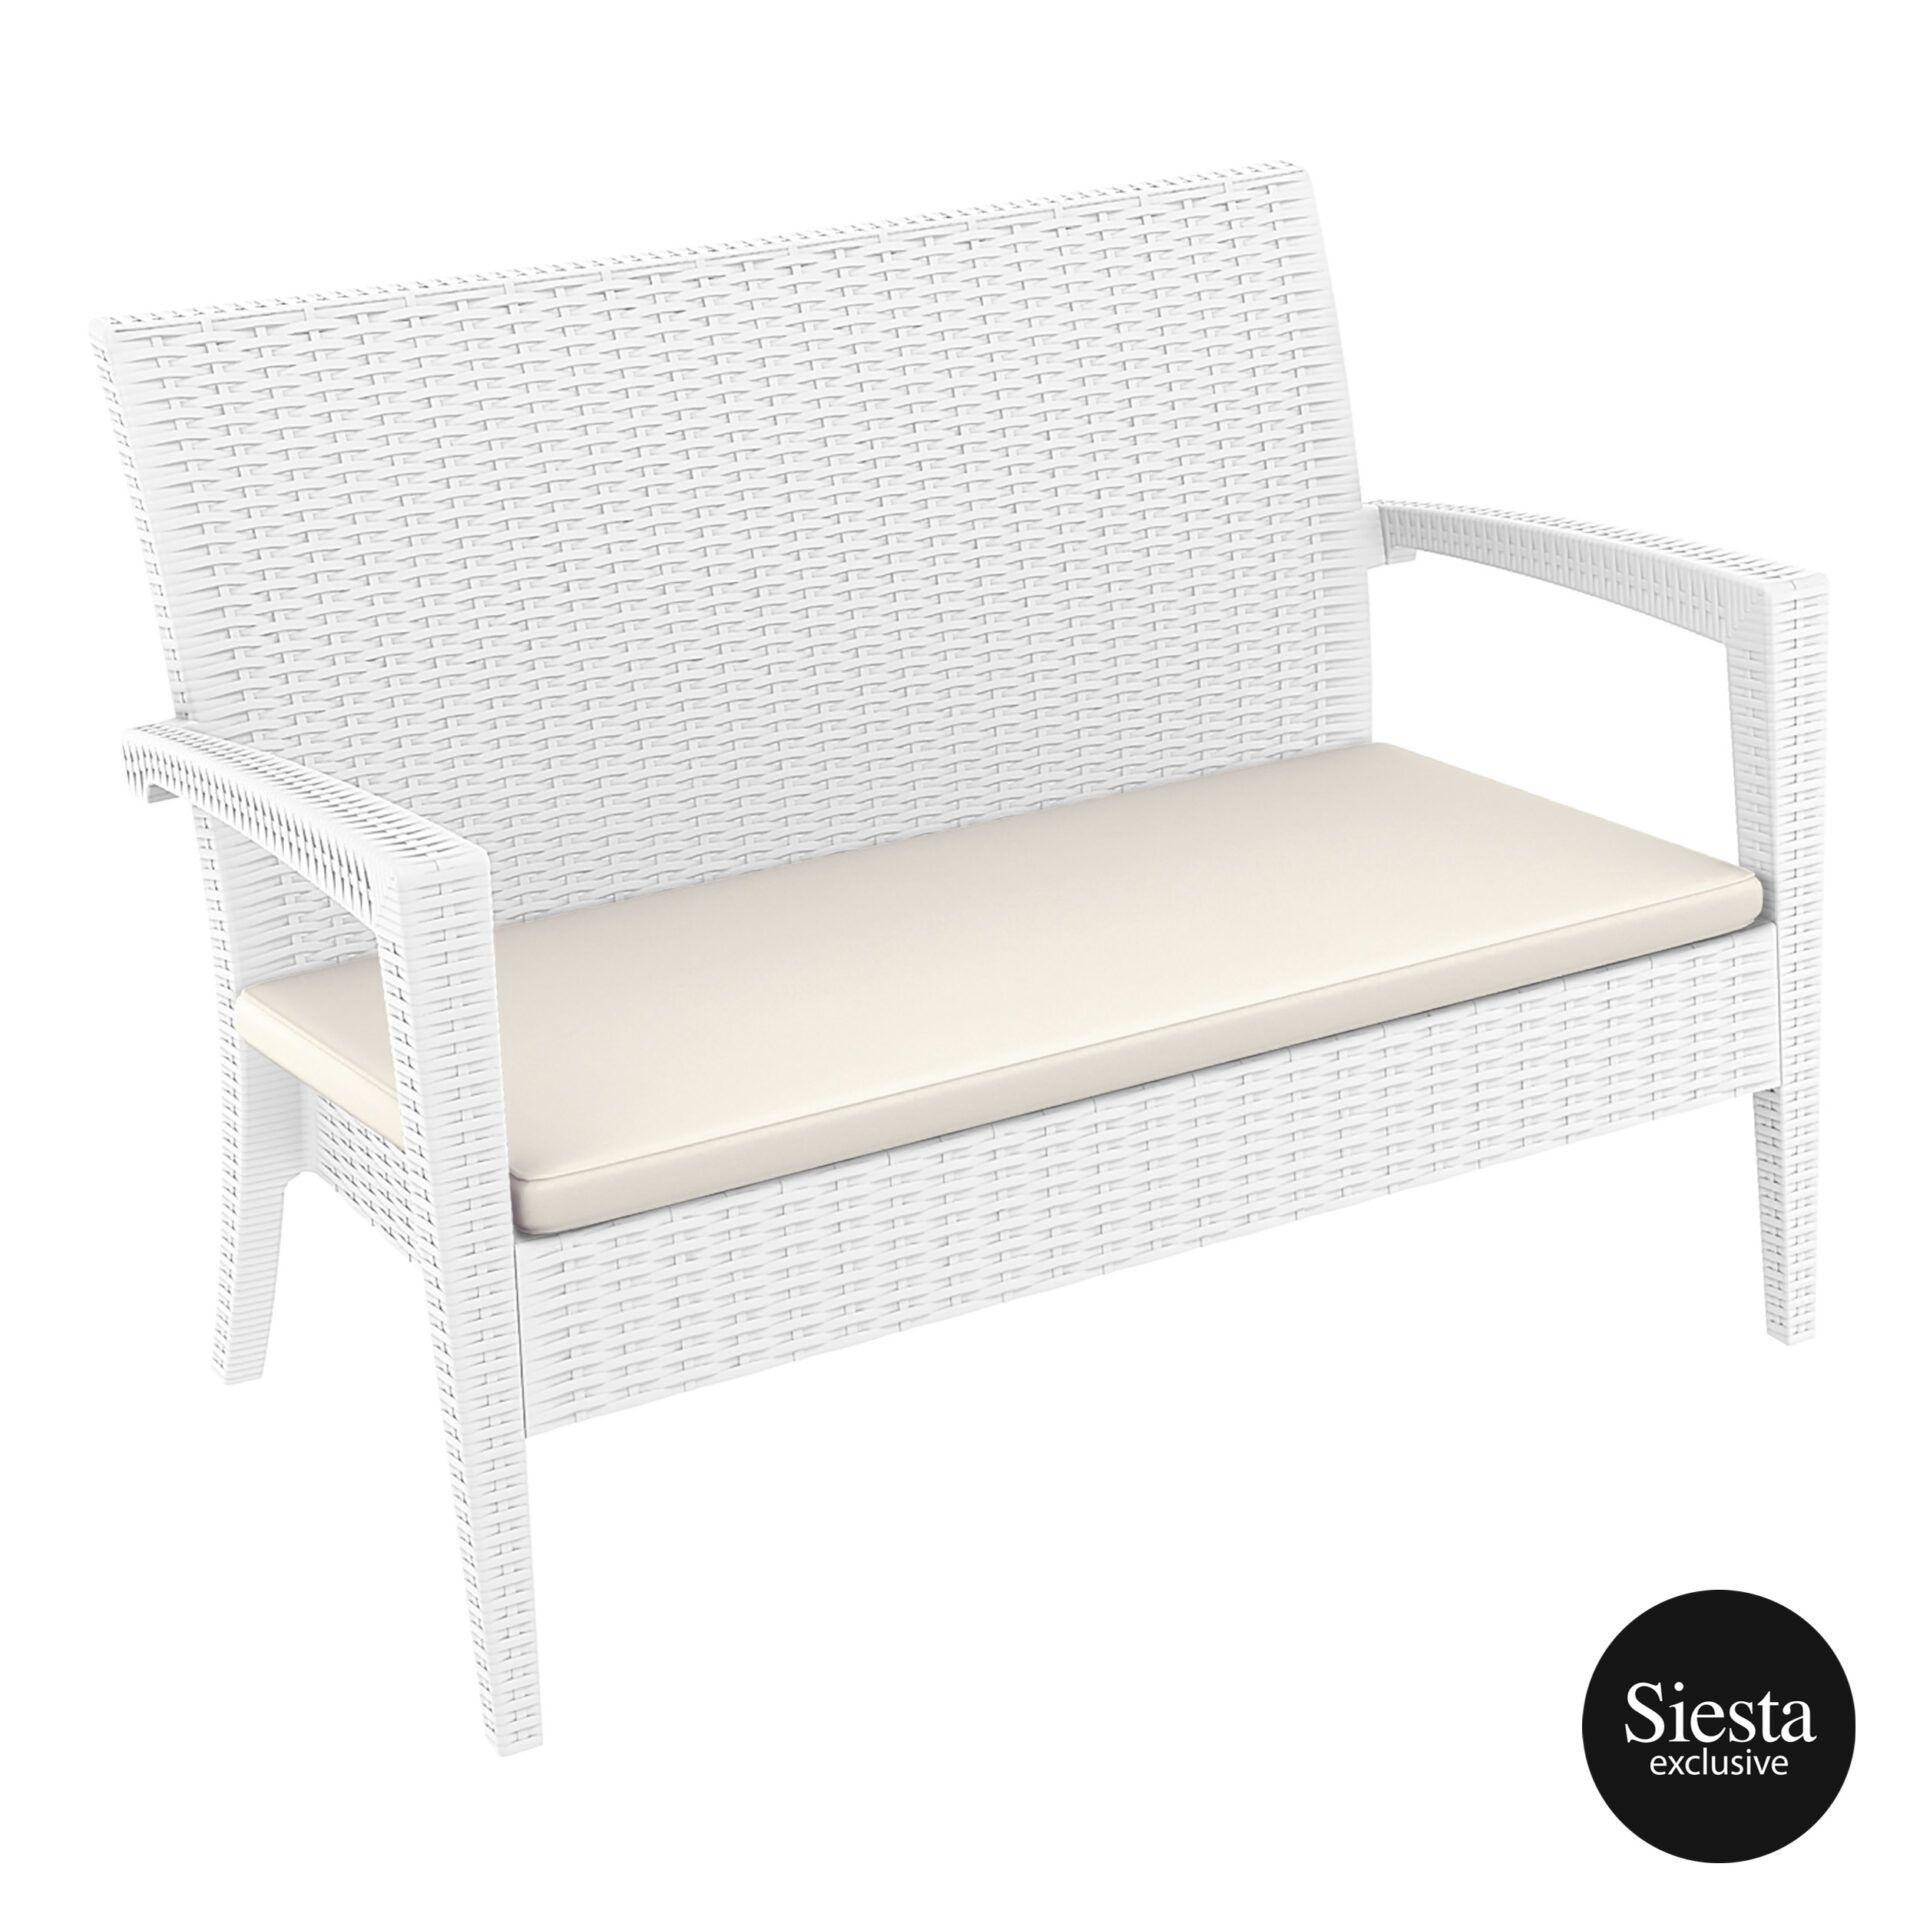 Resin Rattan Miami Tequila Lounge sofa cushion white front side